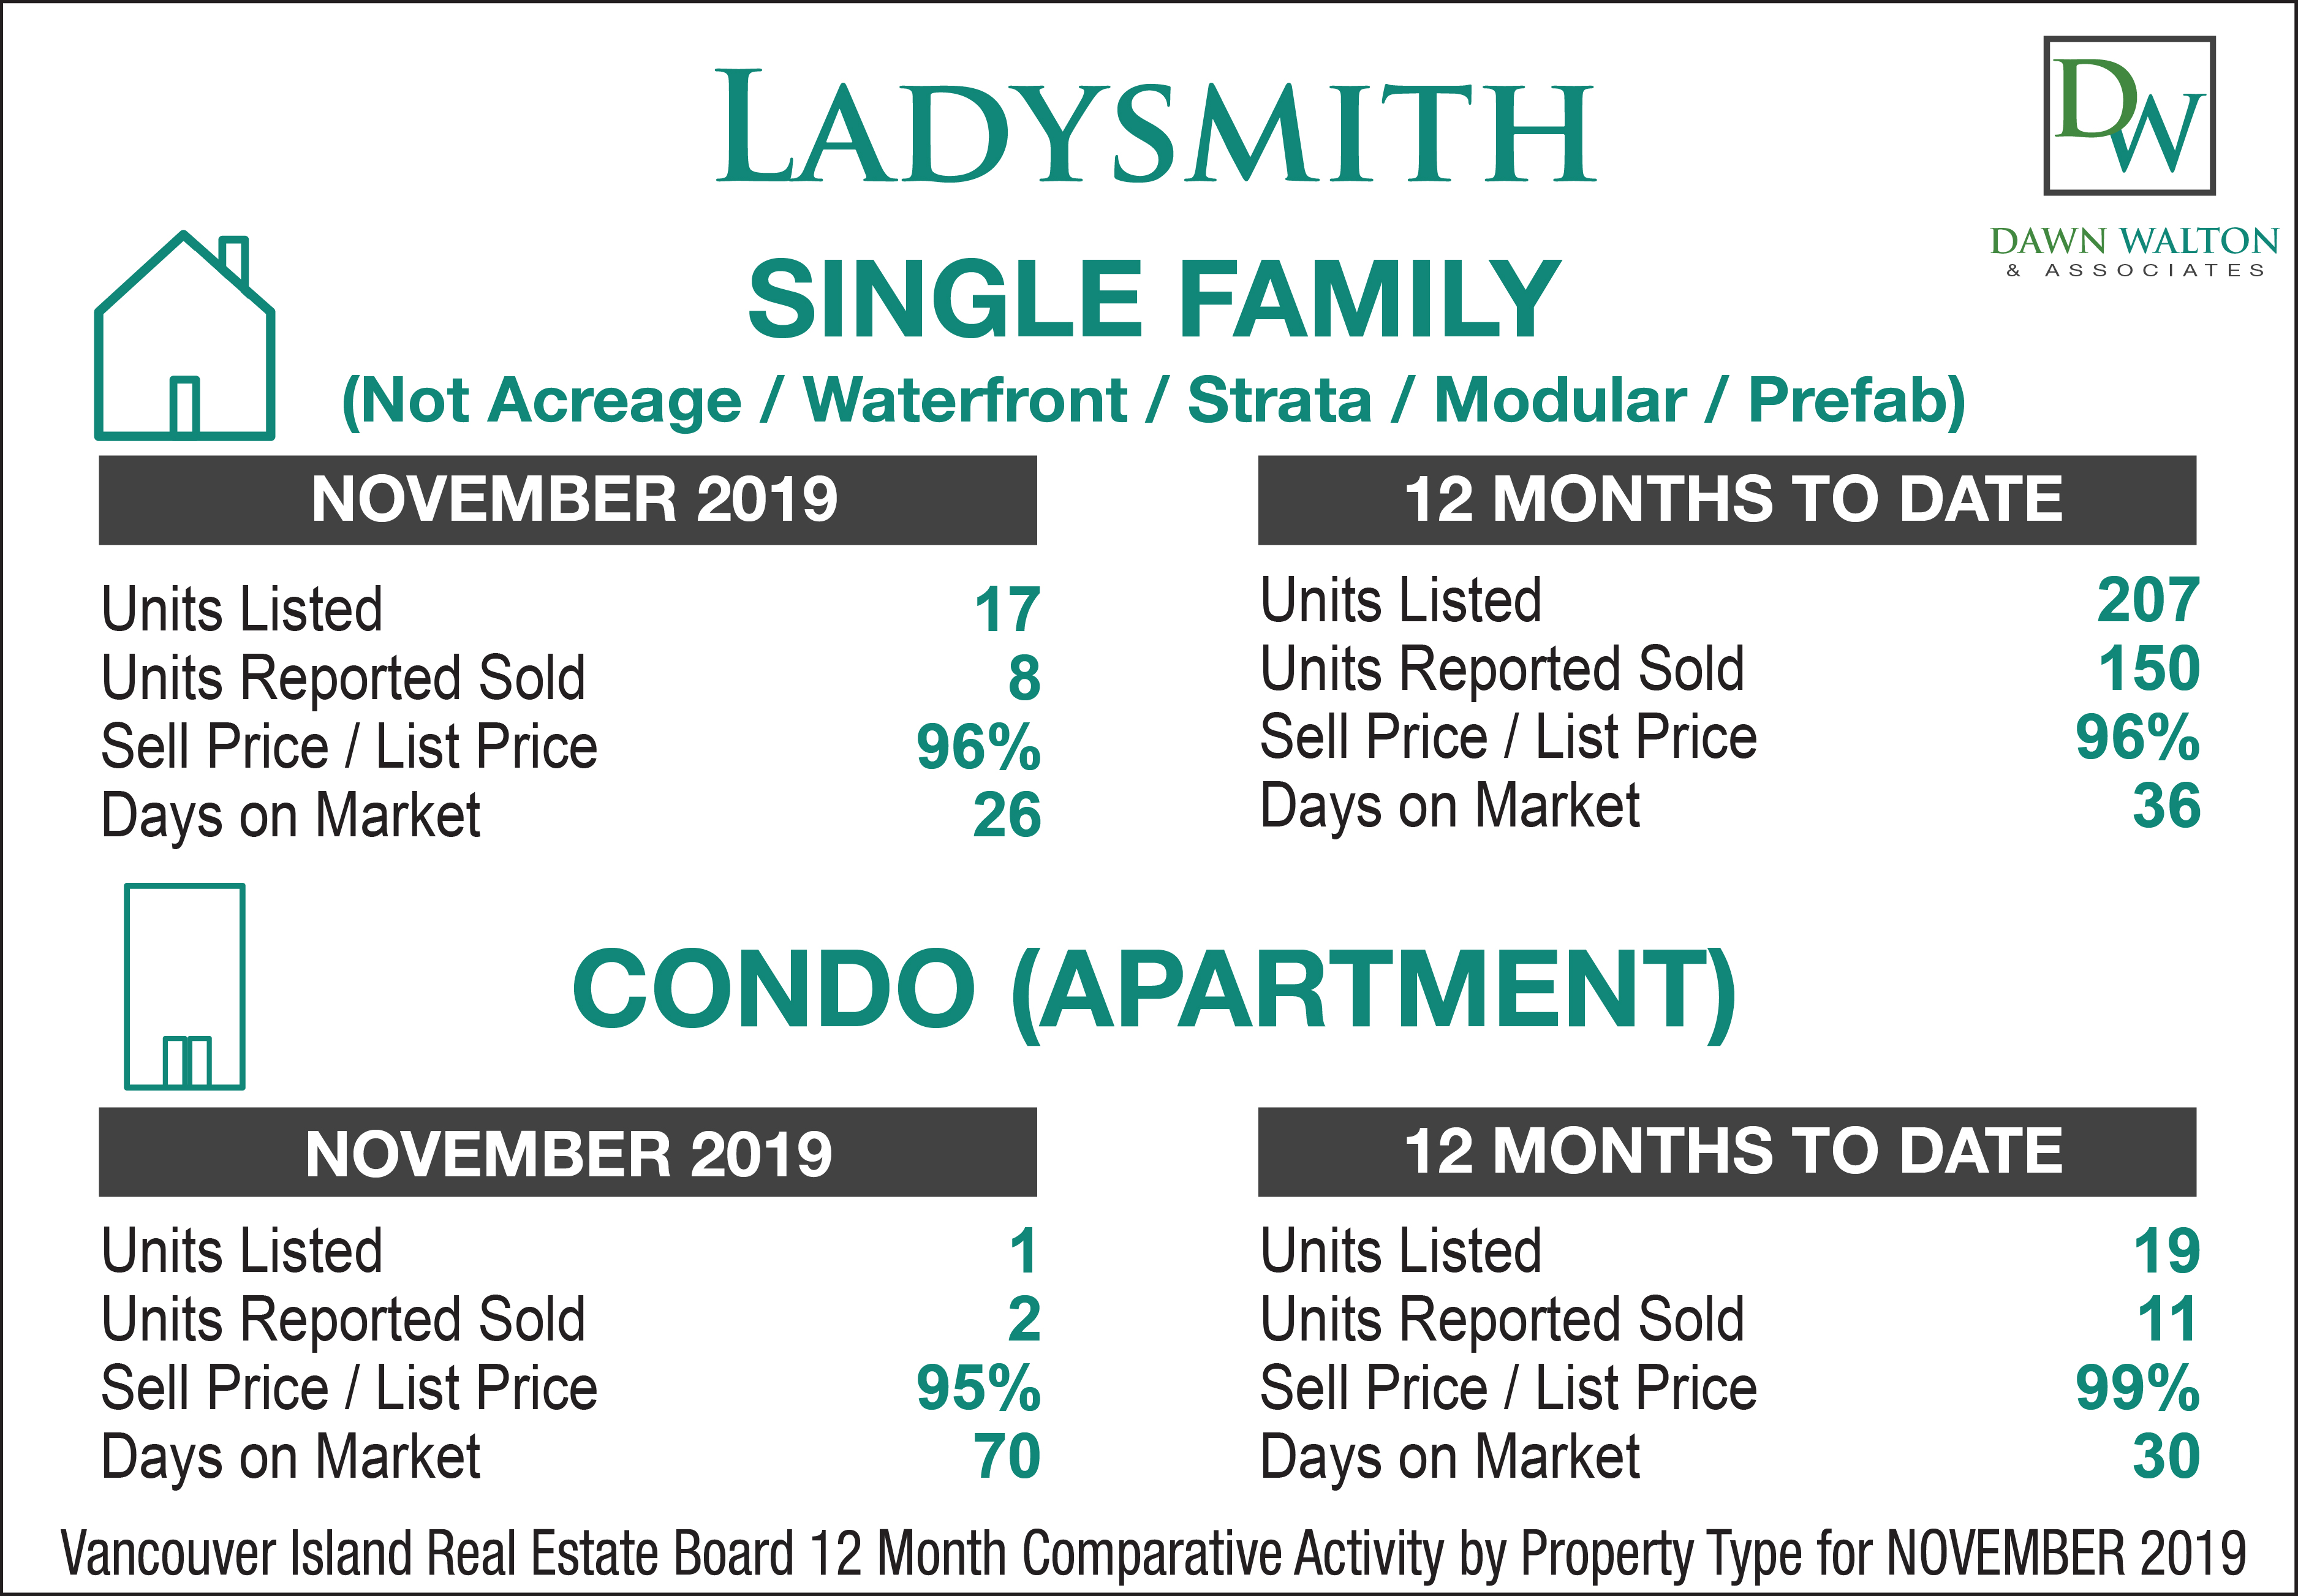 Ladysmith Real Estate Market Stats November  2019 - Nanaimo Realtor Dawn Walton